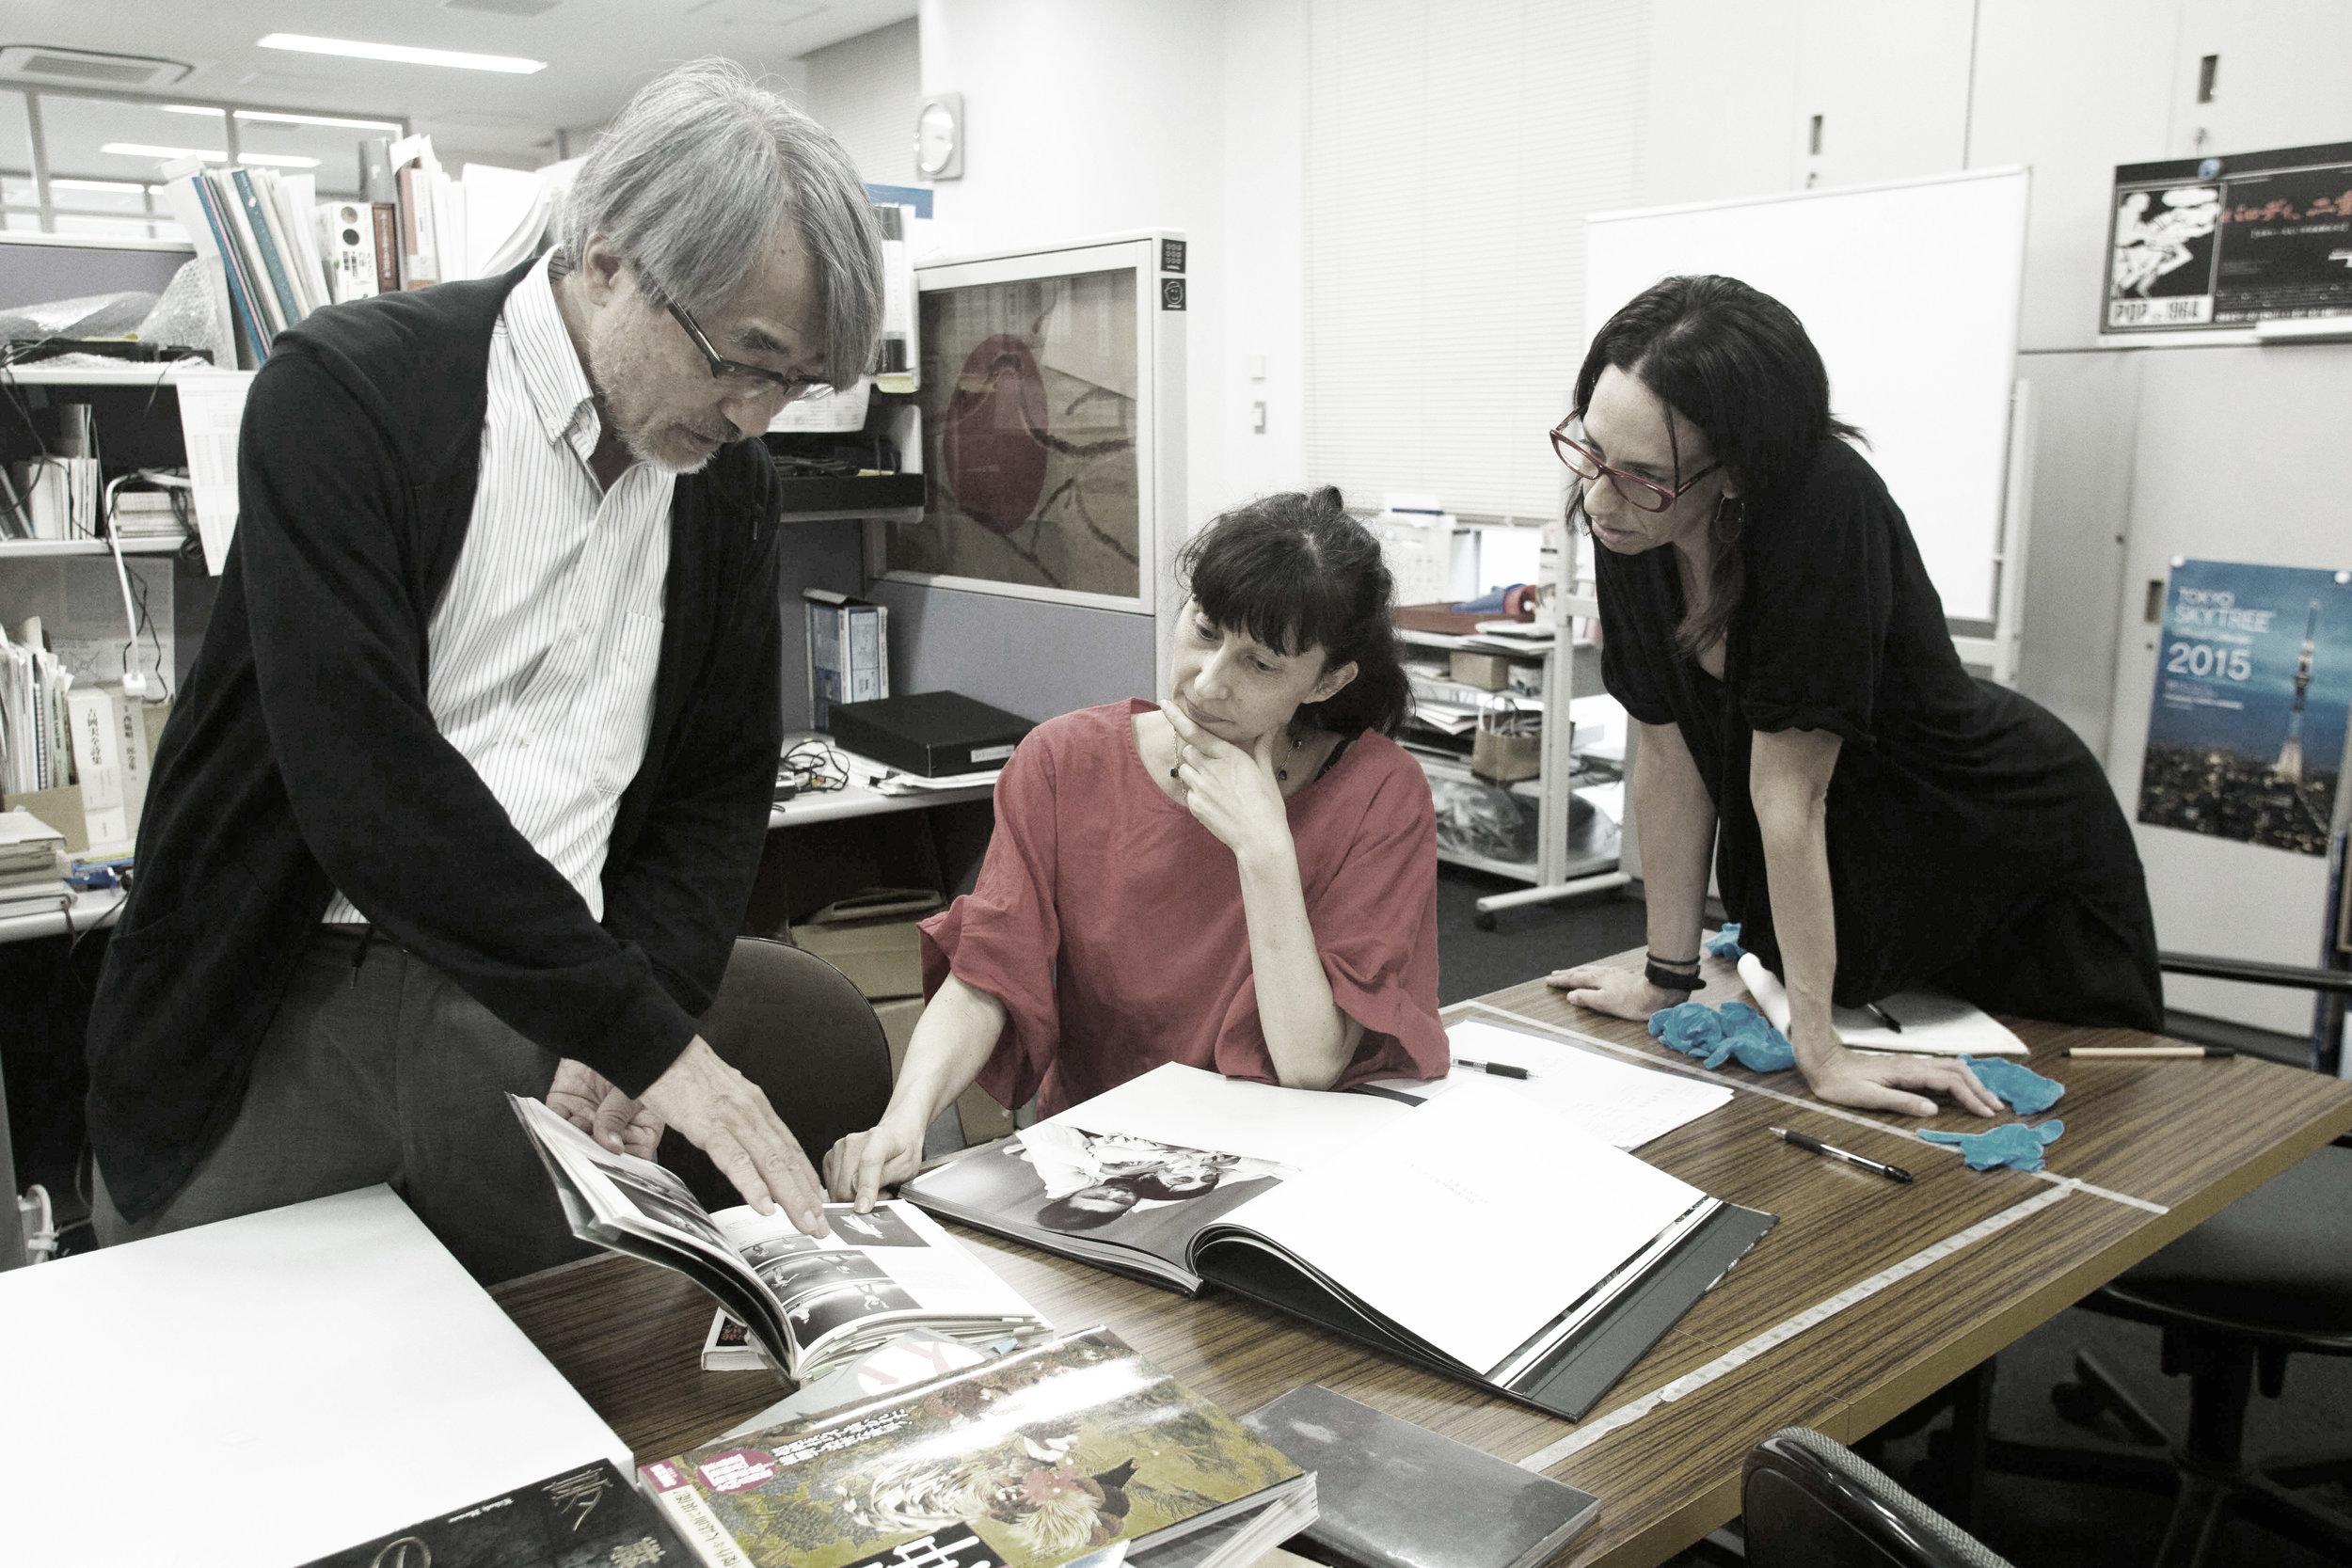 Mr. Morishita, Vangeline, Azumi Oe and Shoshana Green at the Tastumi Hijikata Archives, August 10th, 2017.Photo Azumi Oe.